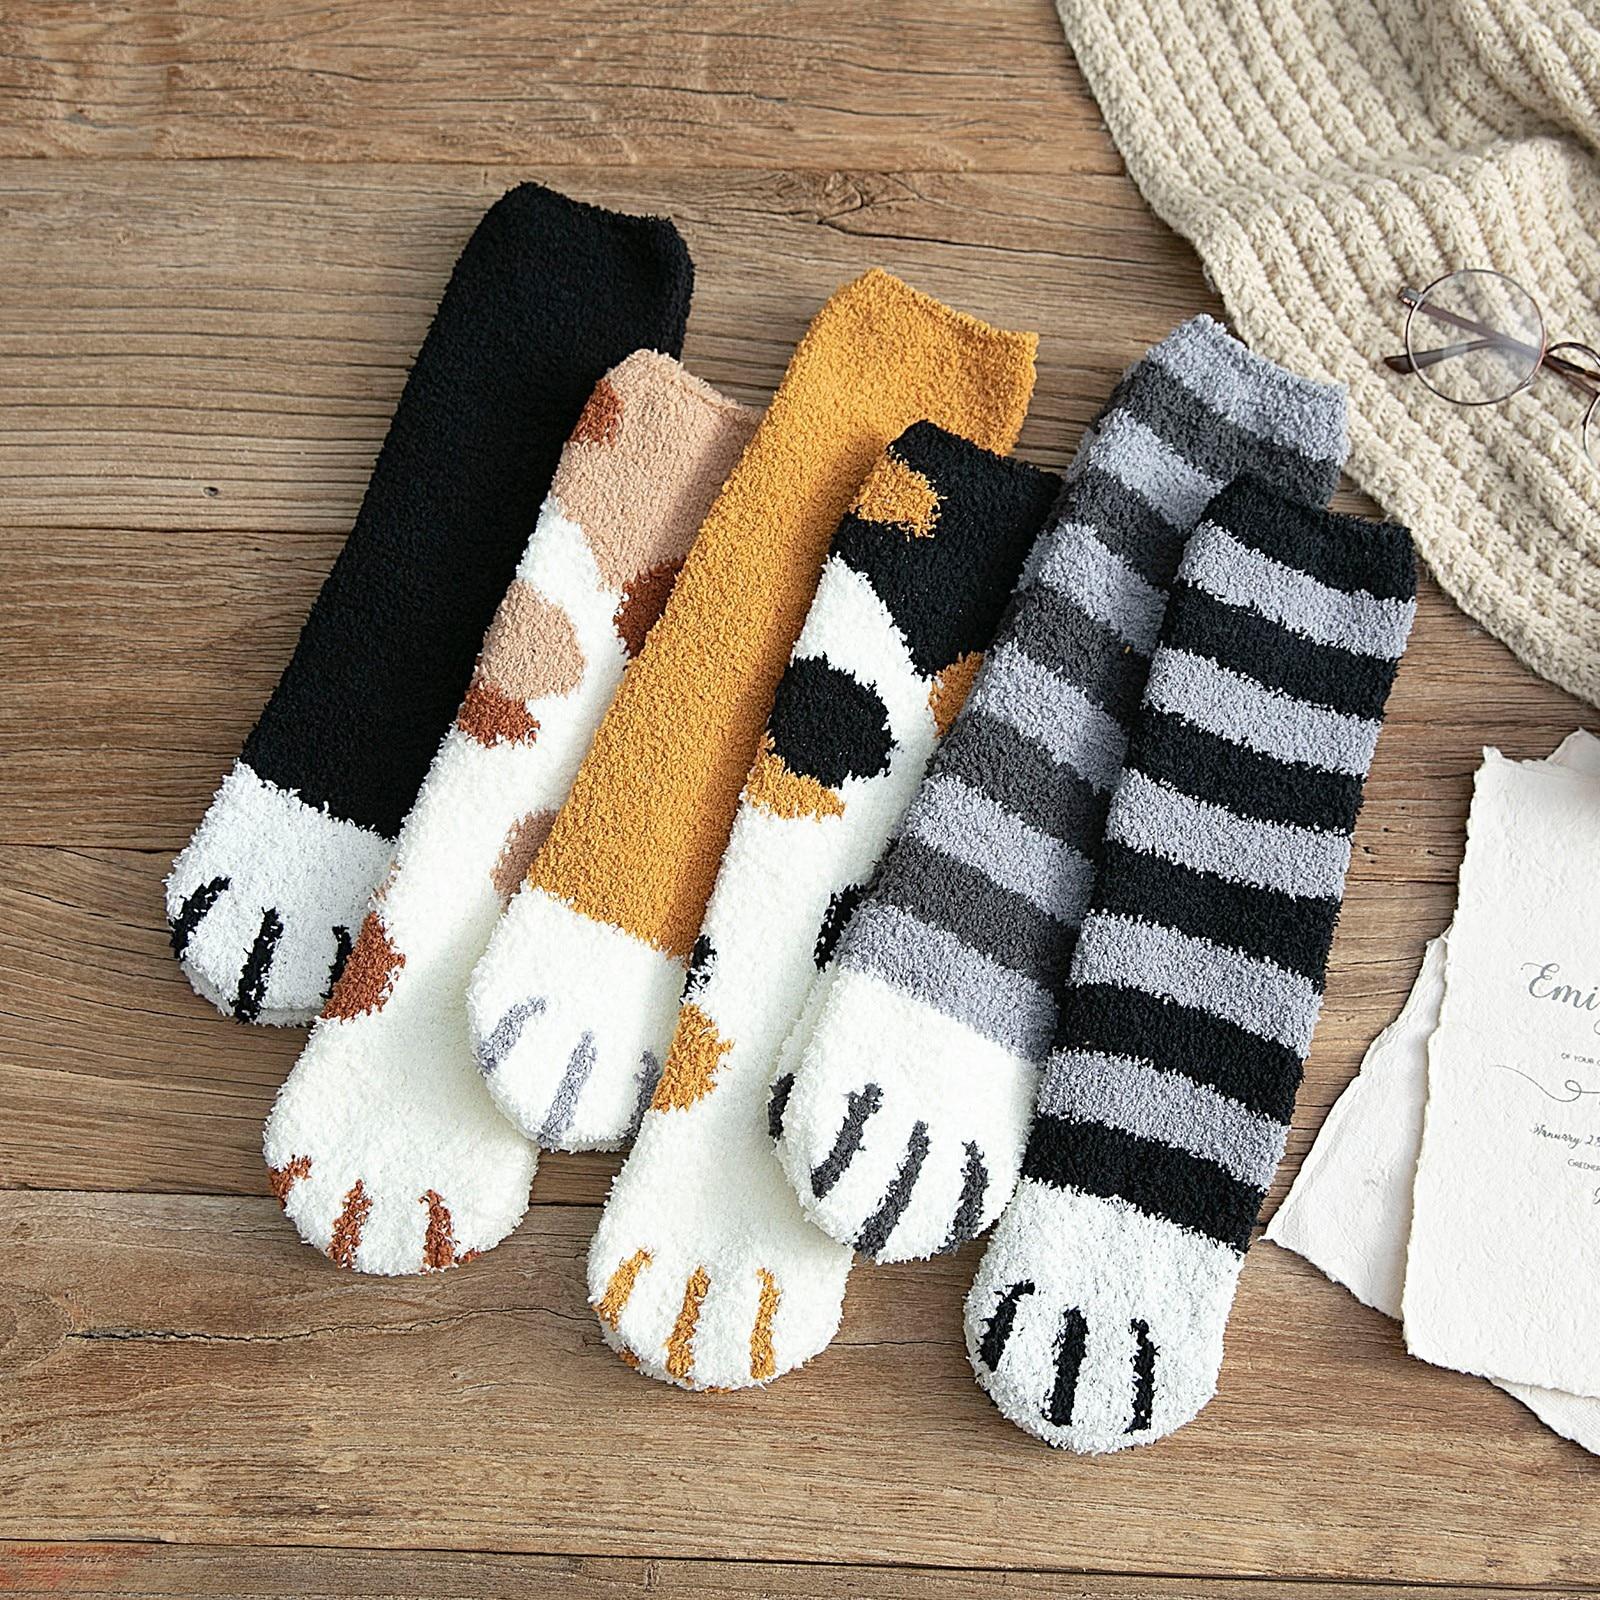 Thick Warm Sleep Floor Socks Winter Cat Kitty Claws Women Girls Sleeping Socks